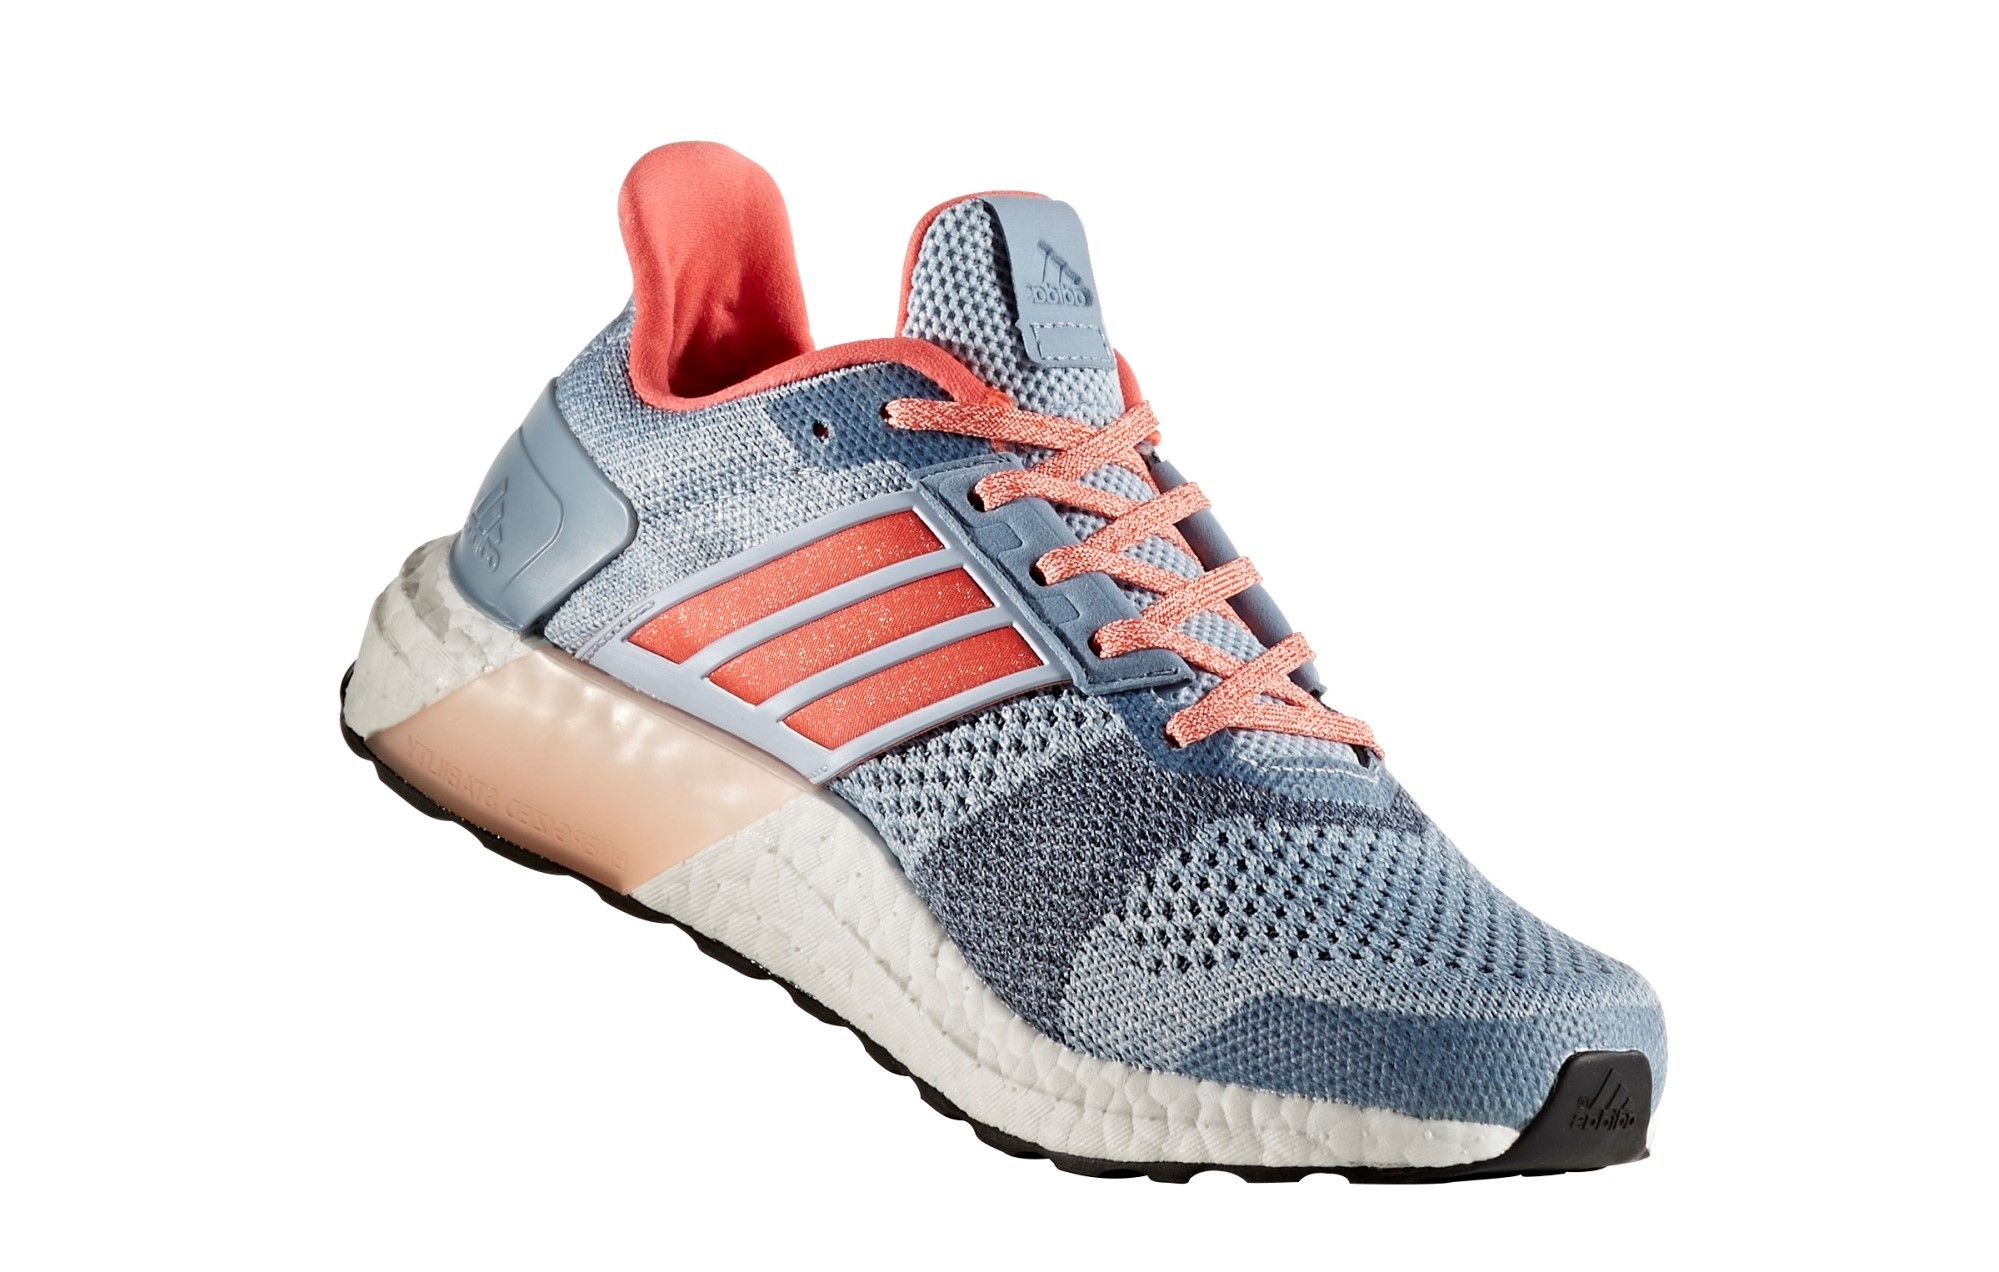 Dámské běžecké boty adidas ULTRABOOST ST W modré  74267d0620